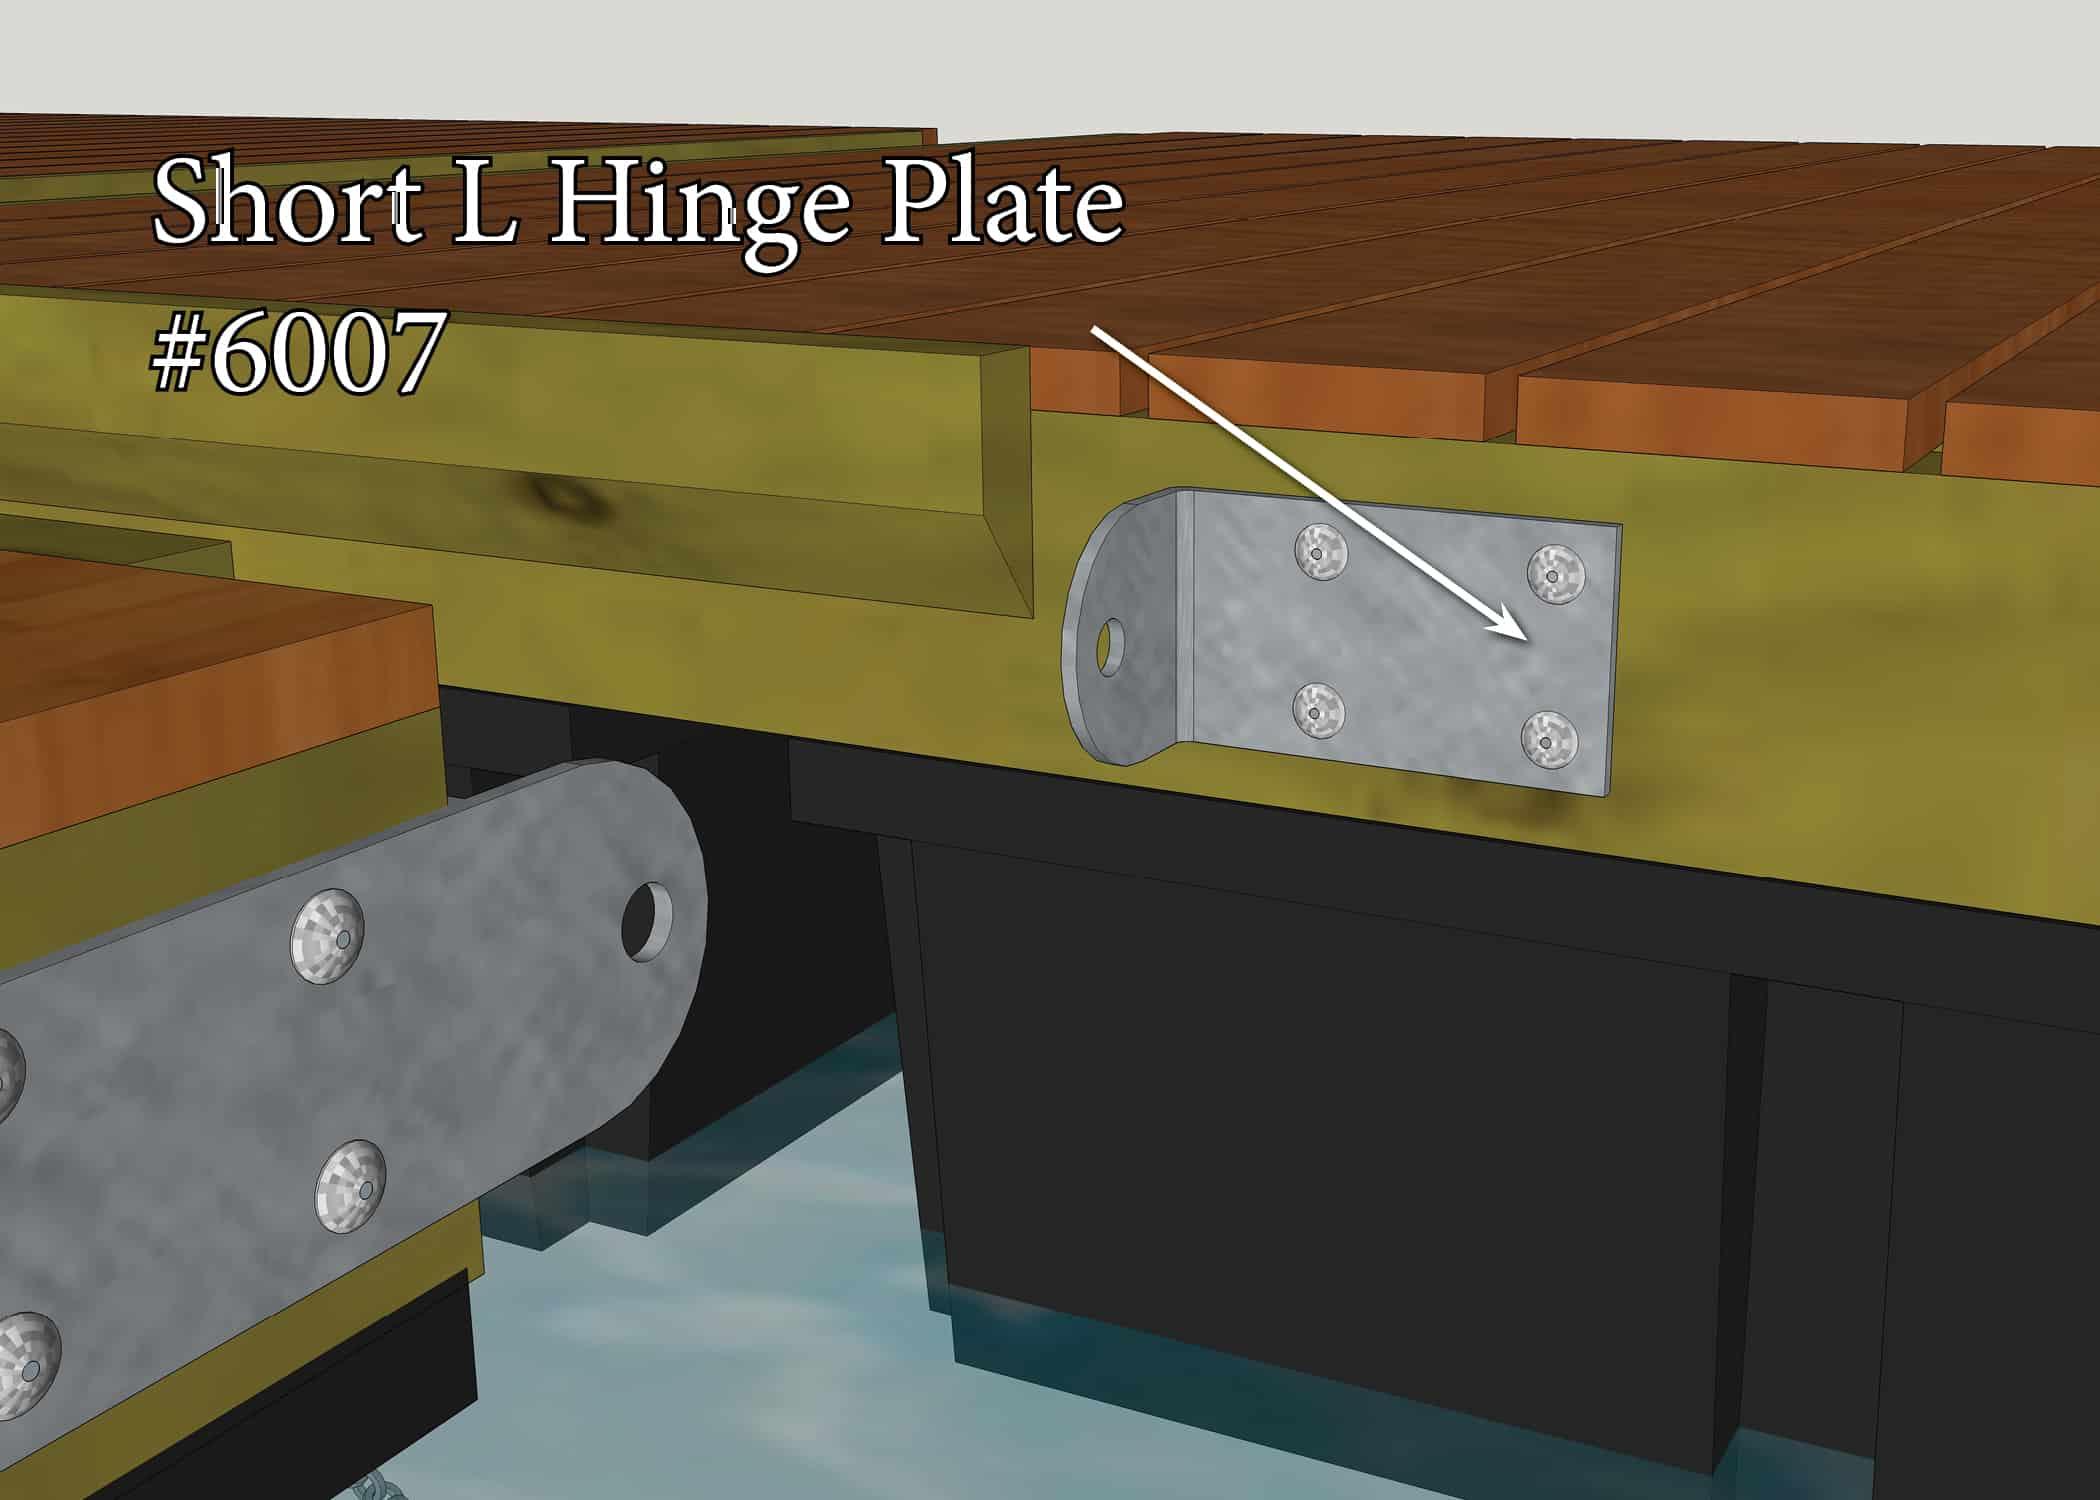 Hinged Dock Plates : Short l hinge plate great northern docks